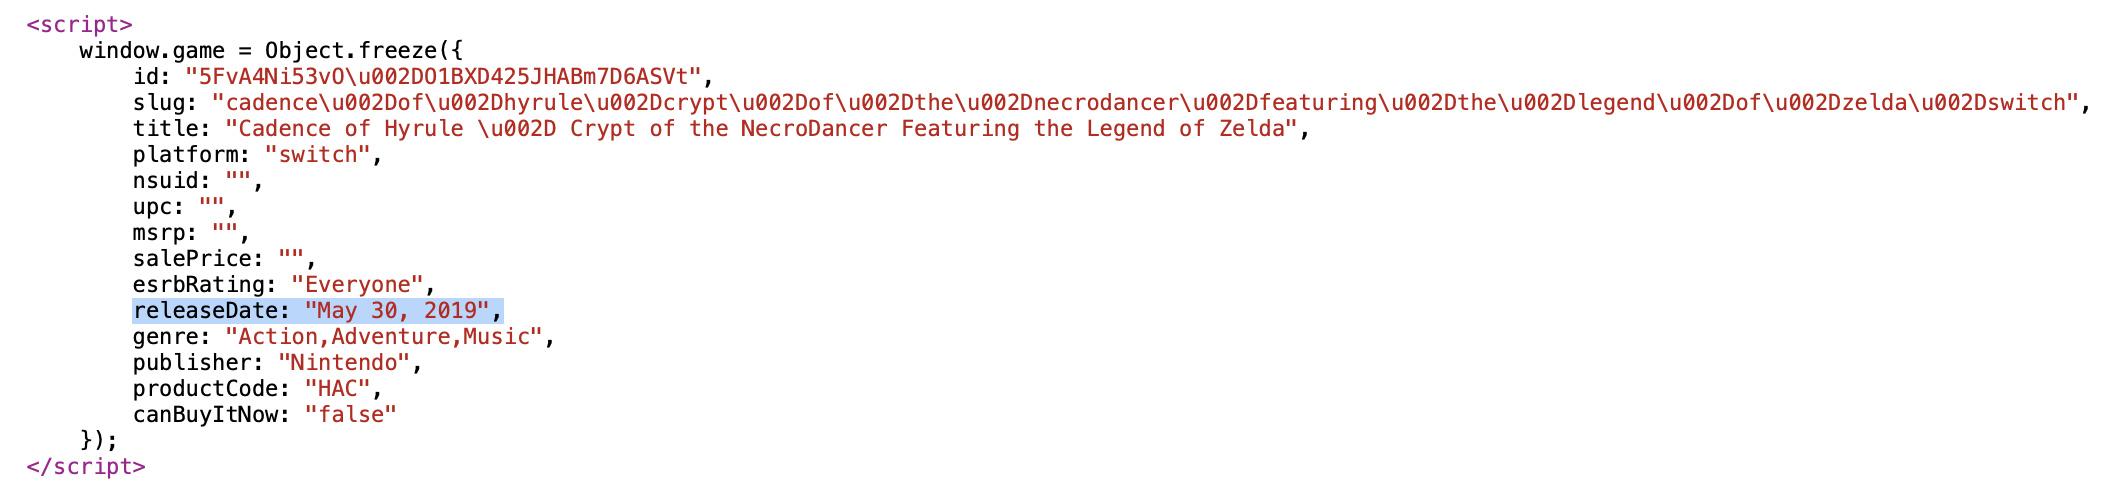 Nes Game Source Code